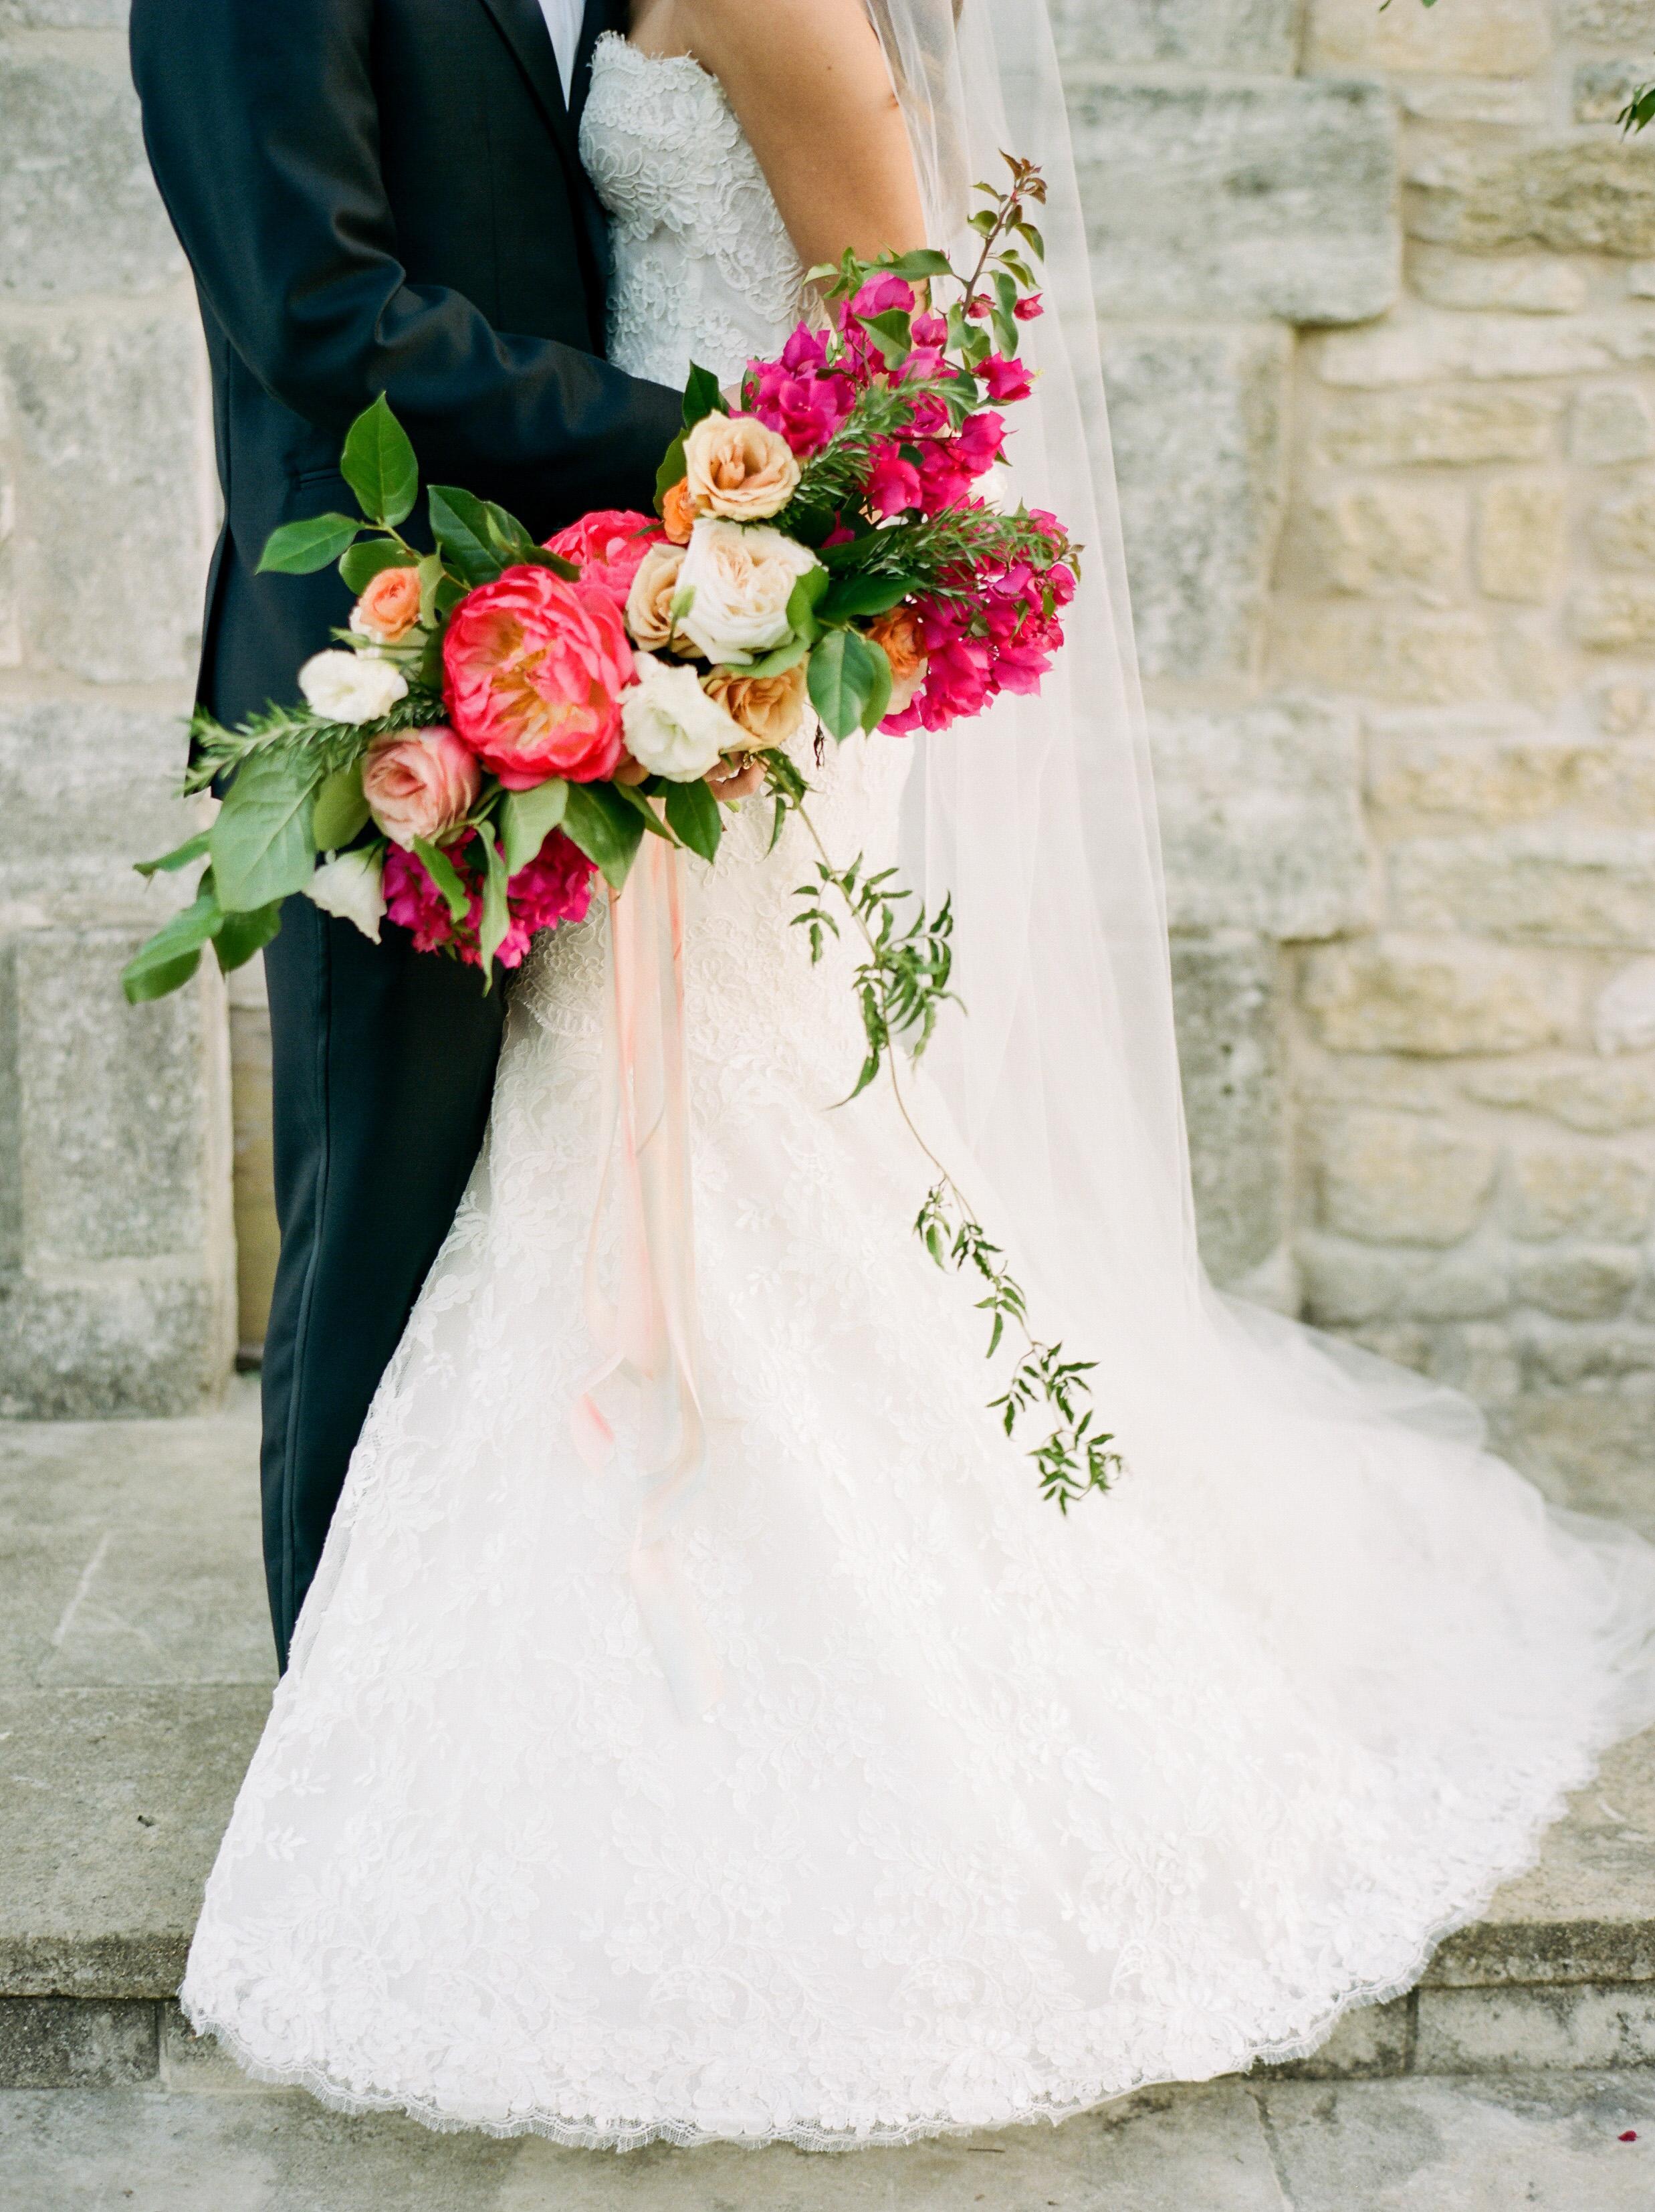 Top-Houston-Wedding-Photographer-Dana-Fernandez-Photography-The-Clubs-At-Houston-Oaks-Country-Club-Belle-Events-Film-Fine-Art-Destination-7.jpg